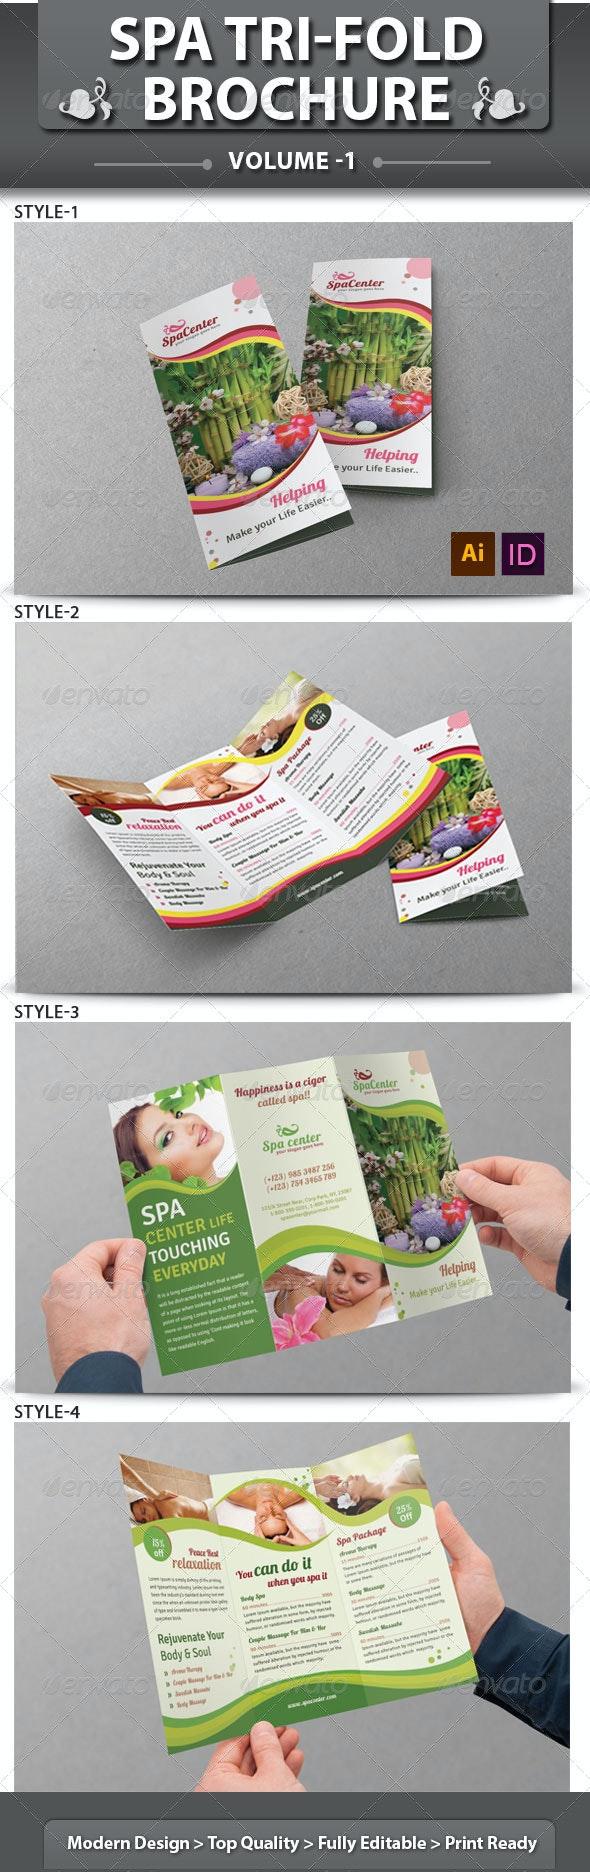 Spa & Beauty Saloon Tri-fold Brochure   Volume 14 - Corporate Brochures